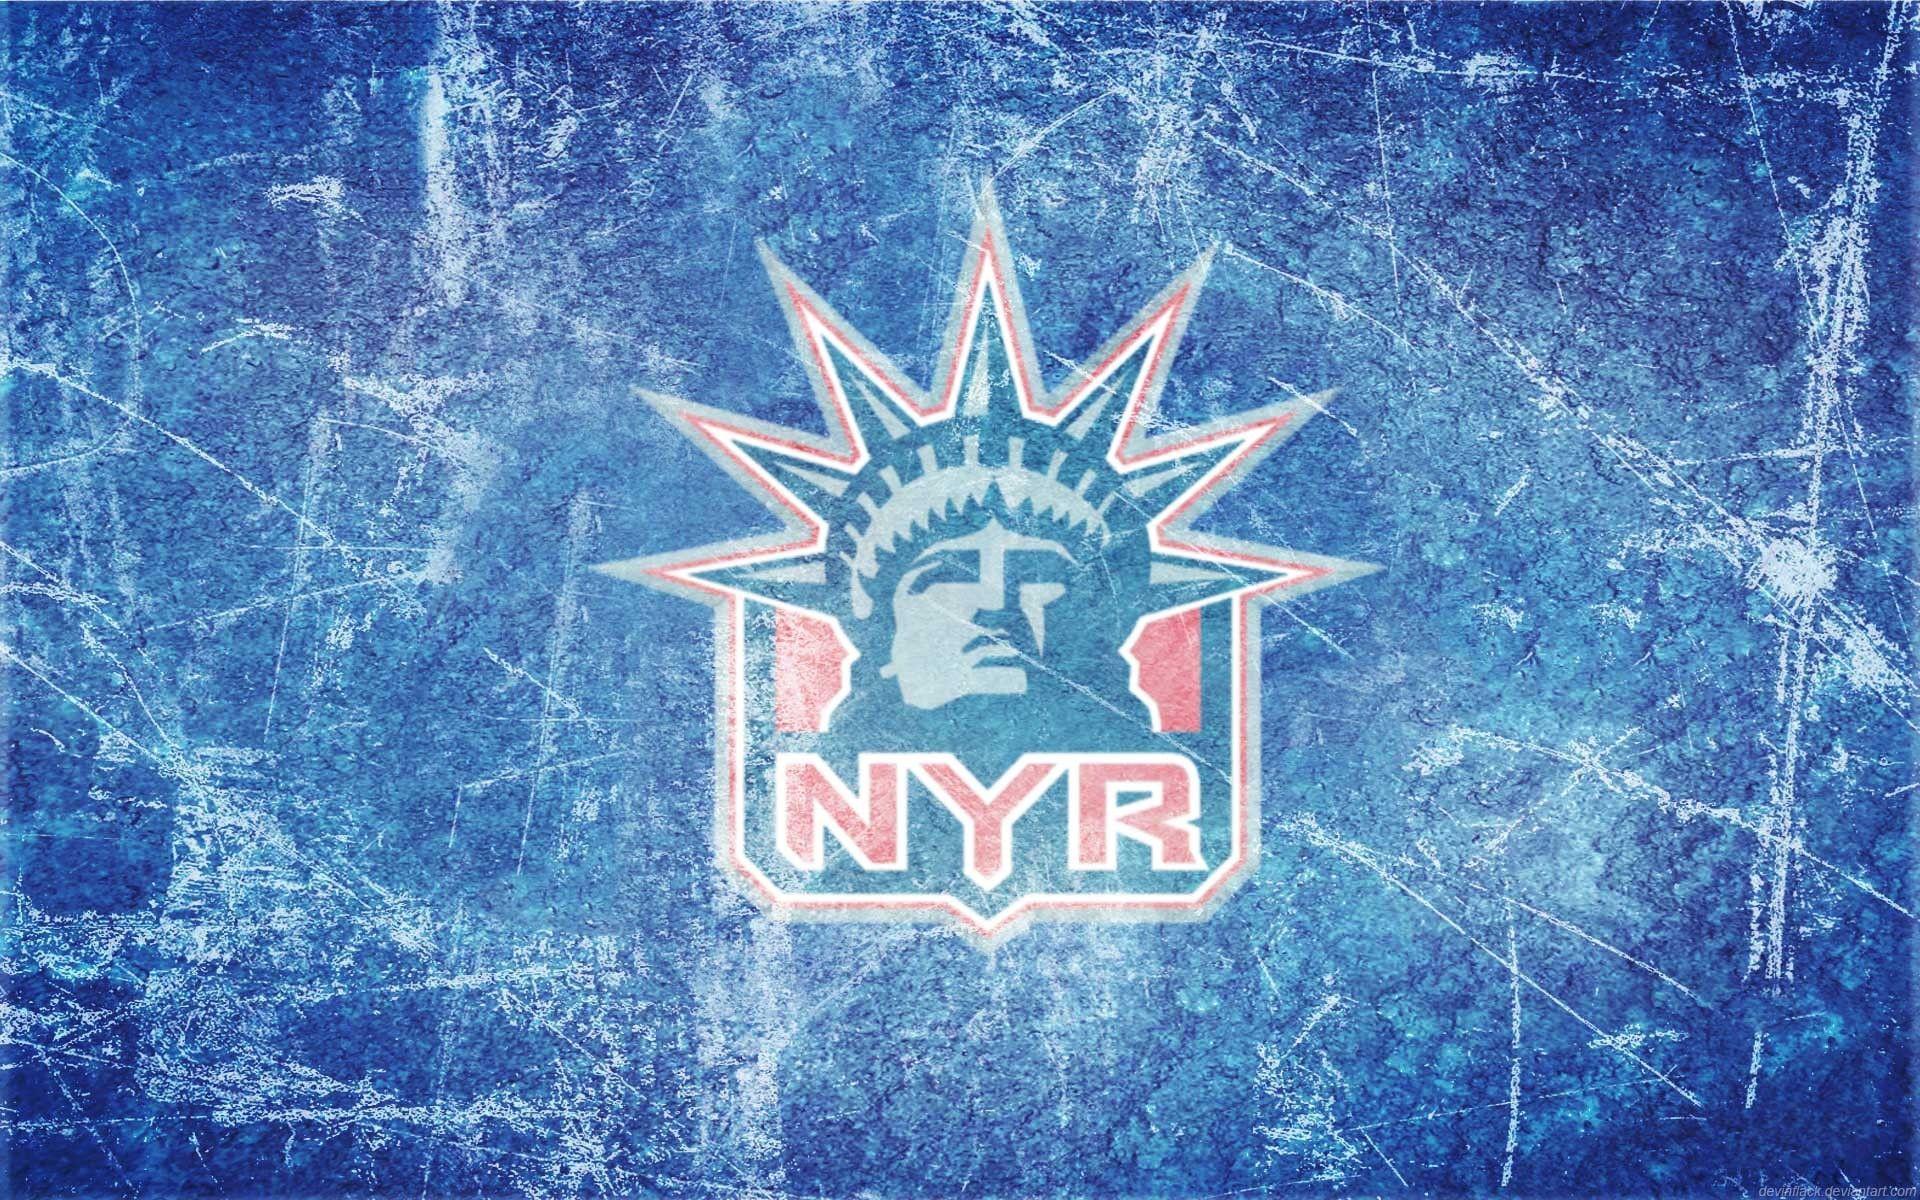 New York Rangers Wallpapers Top Free New York Rangers